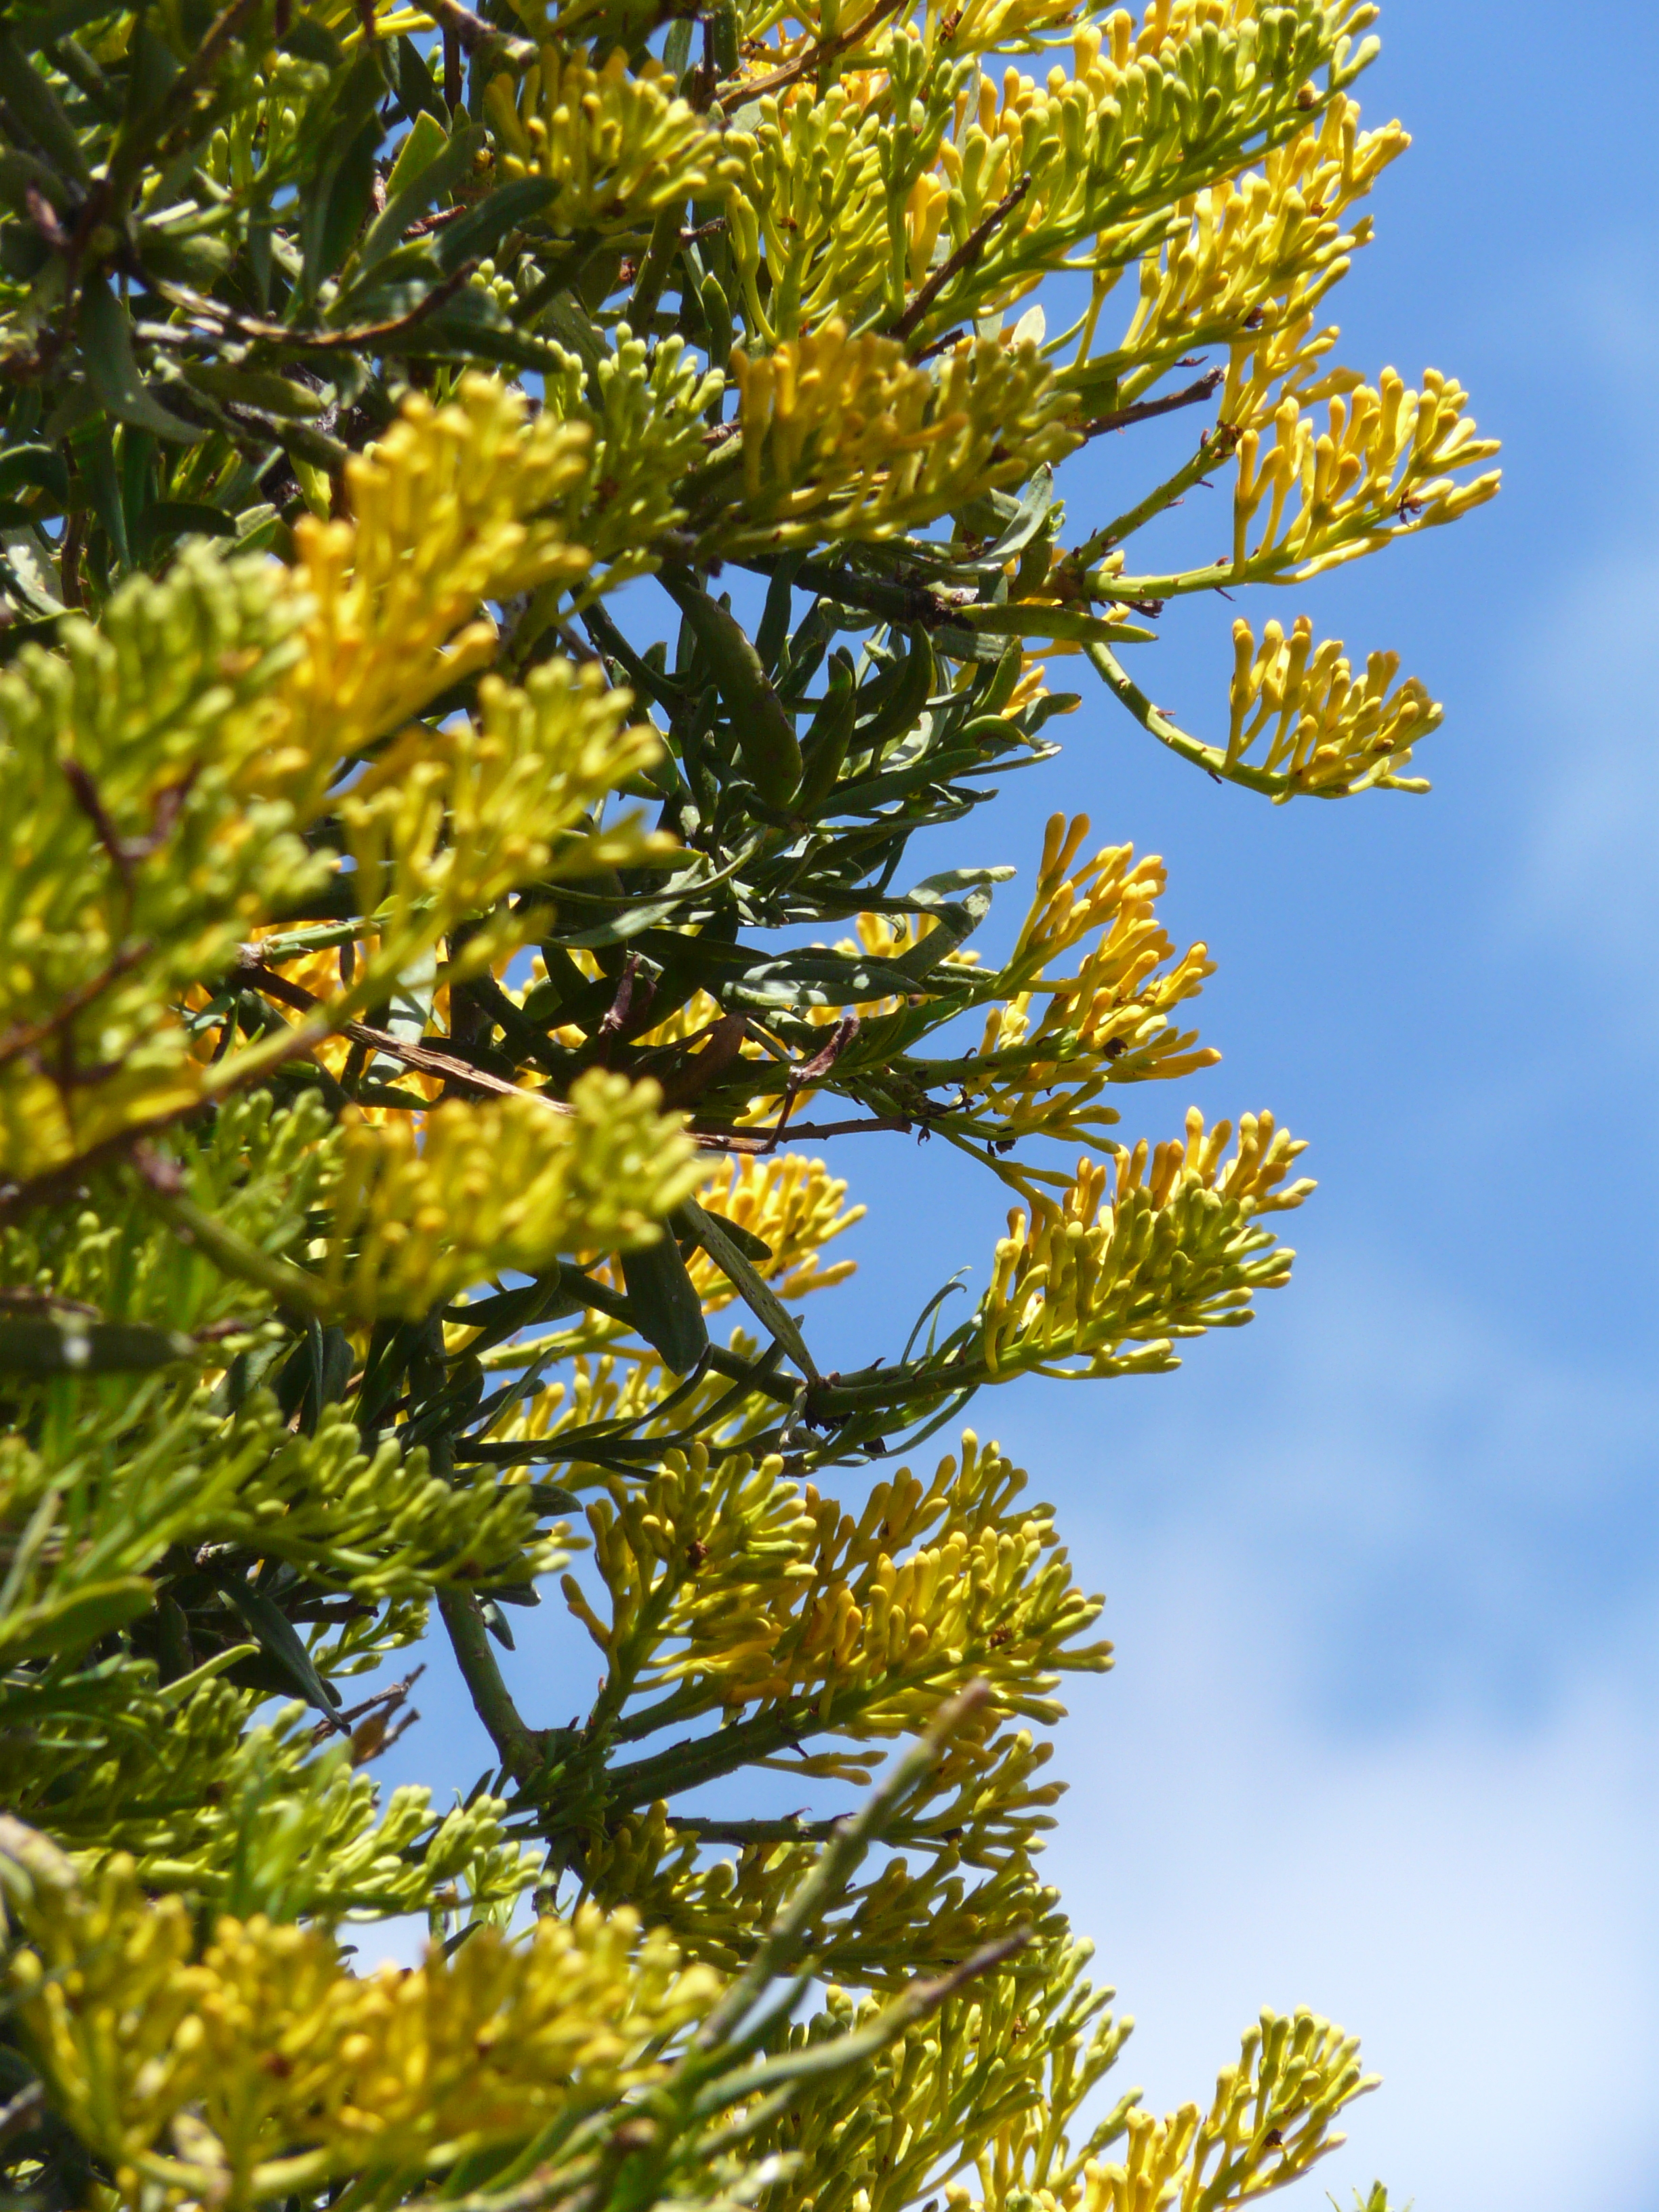 Nuytsia floribunda , just starting to open.